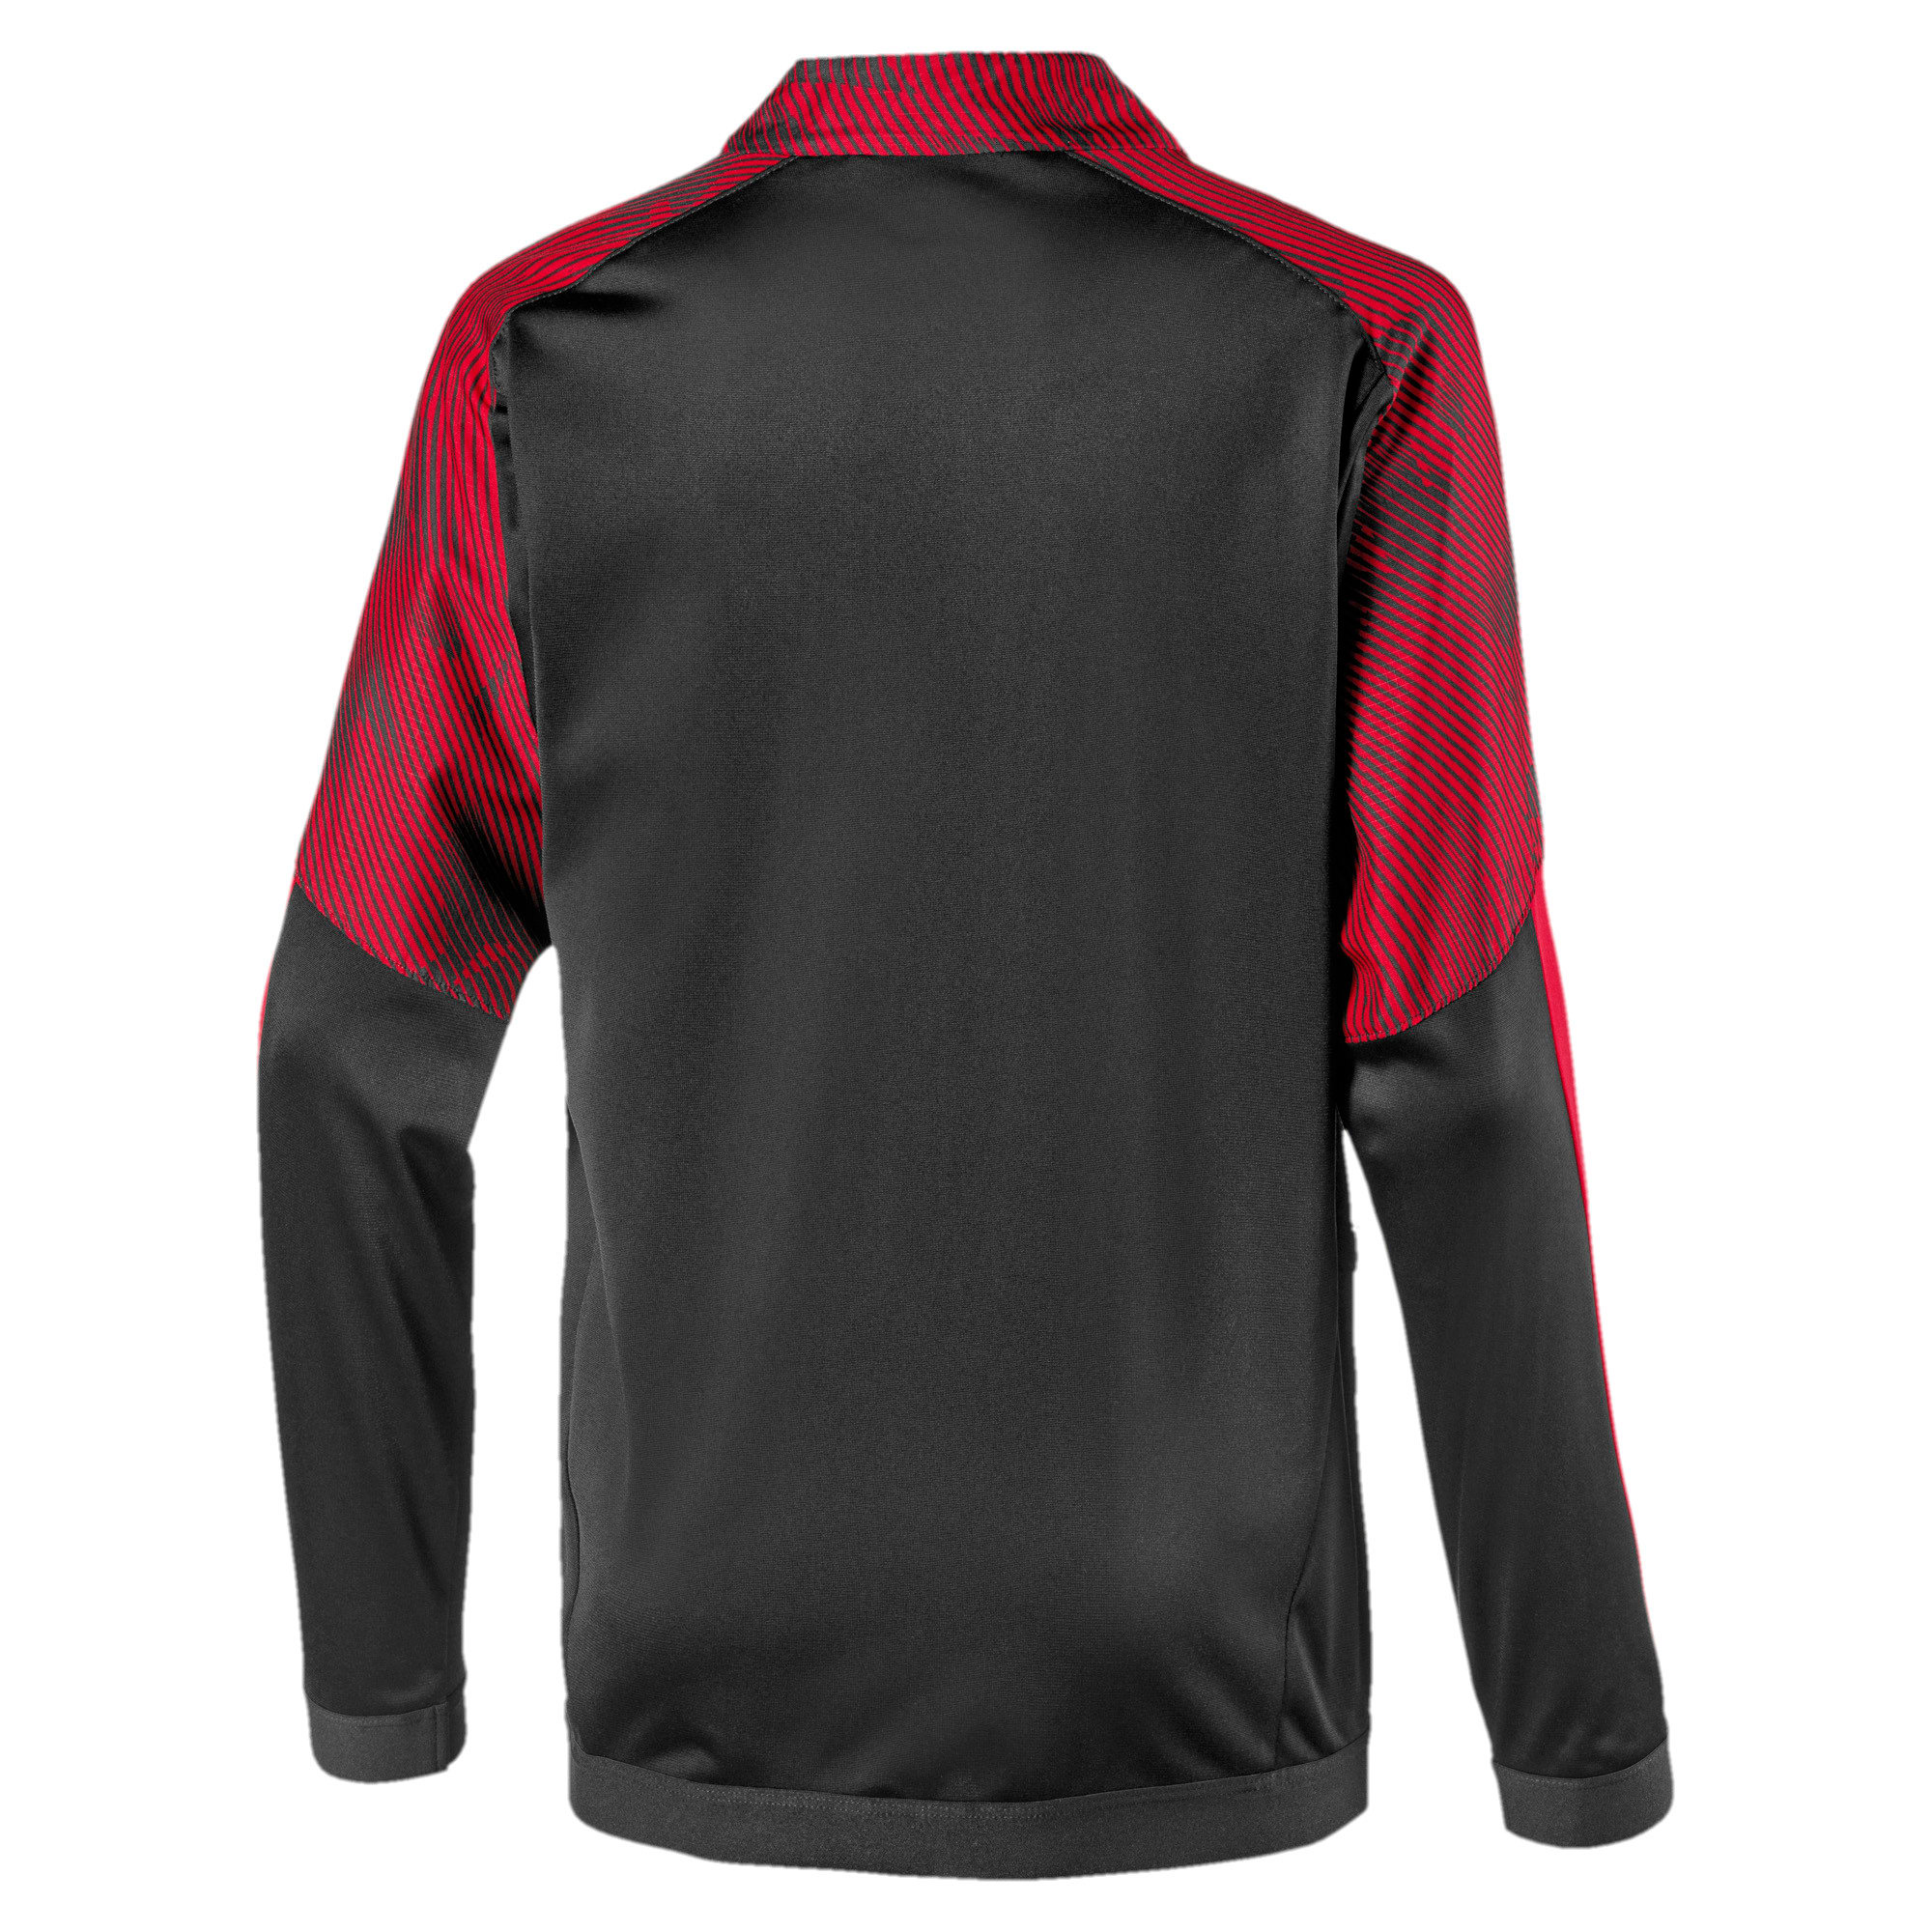 Thumbnail 2 of AC Milan Boys' Poly Jacket, Puma Black-Tango Red, medium